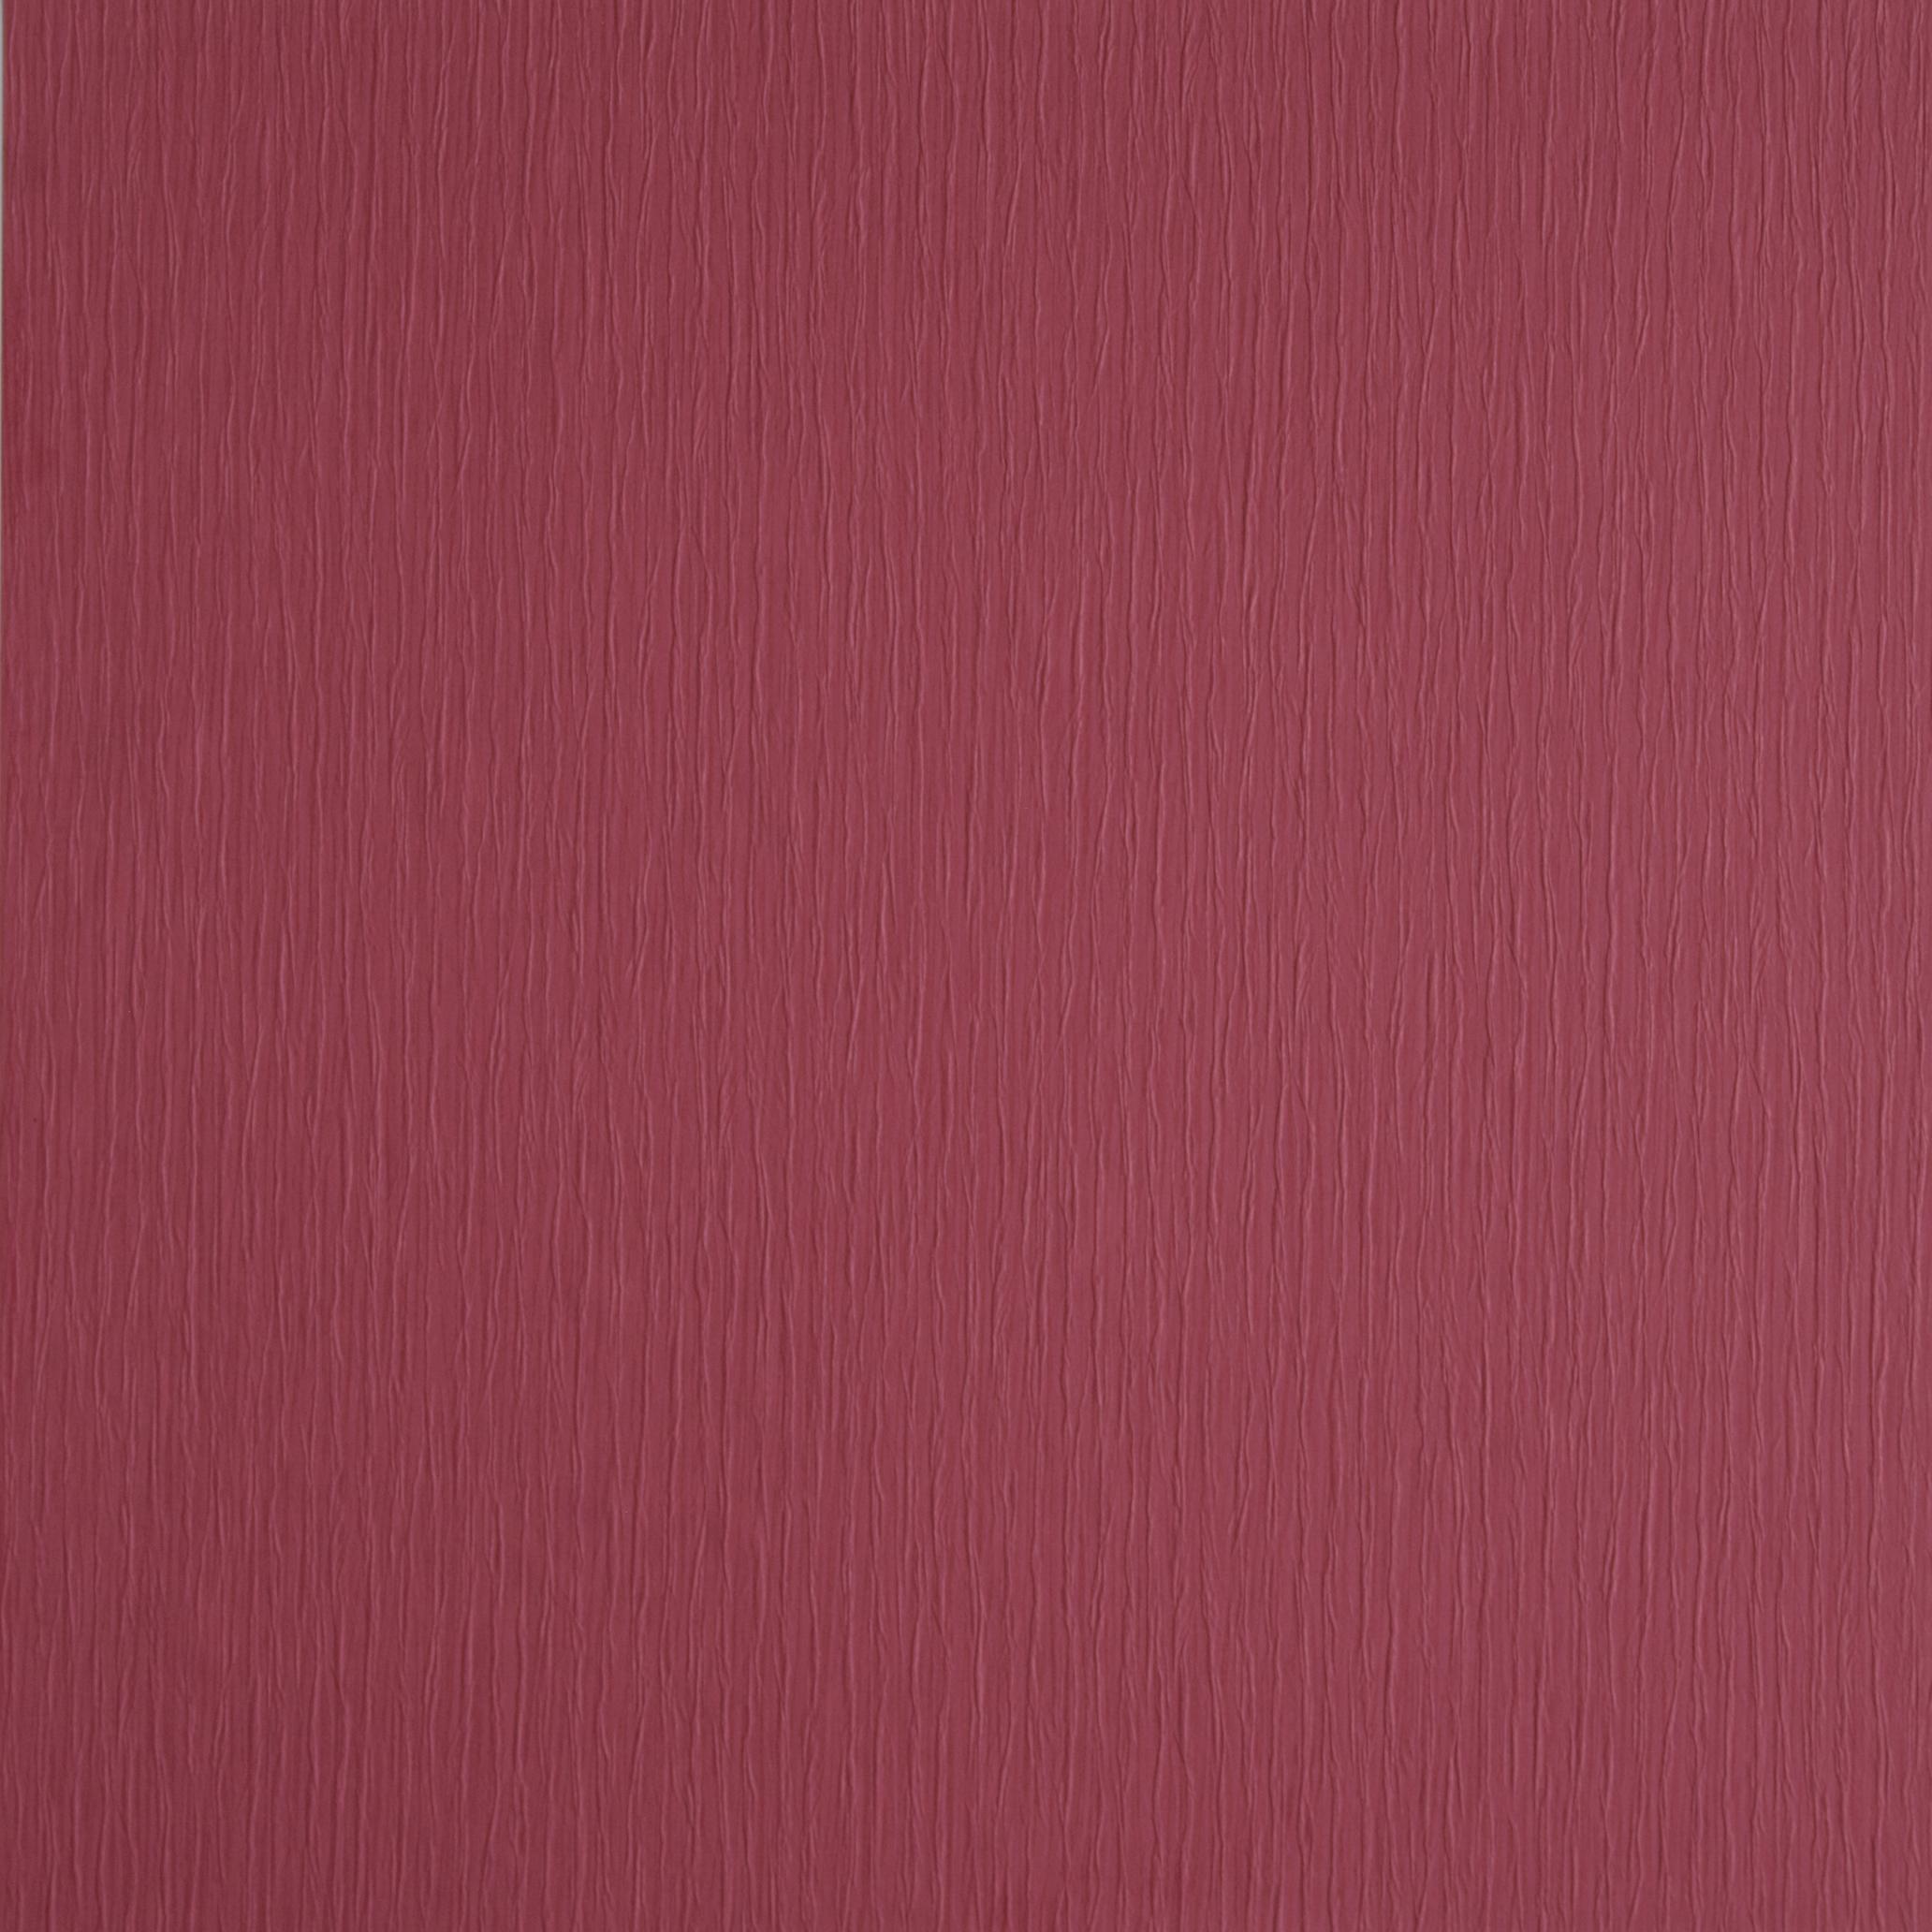 Обои  BN International,  коллекция Colour Line, артикул49473